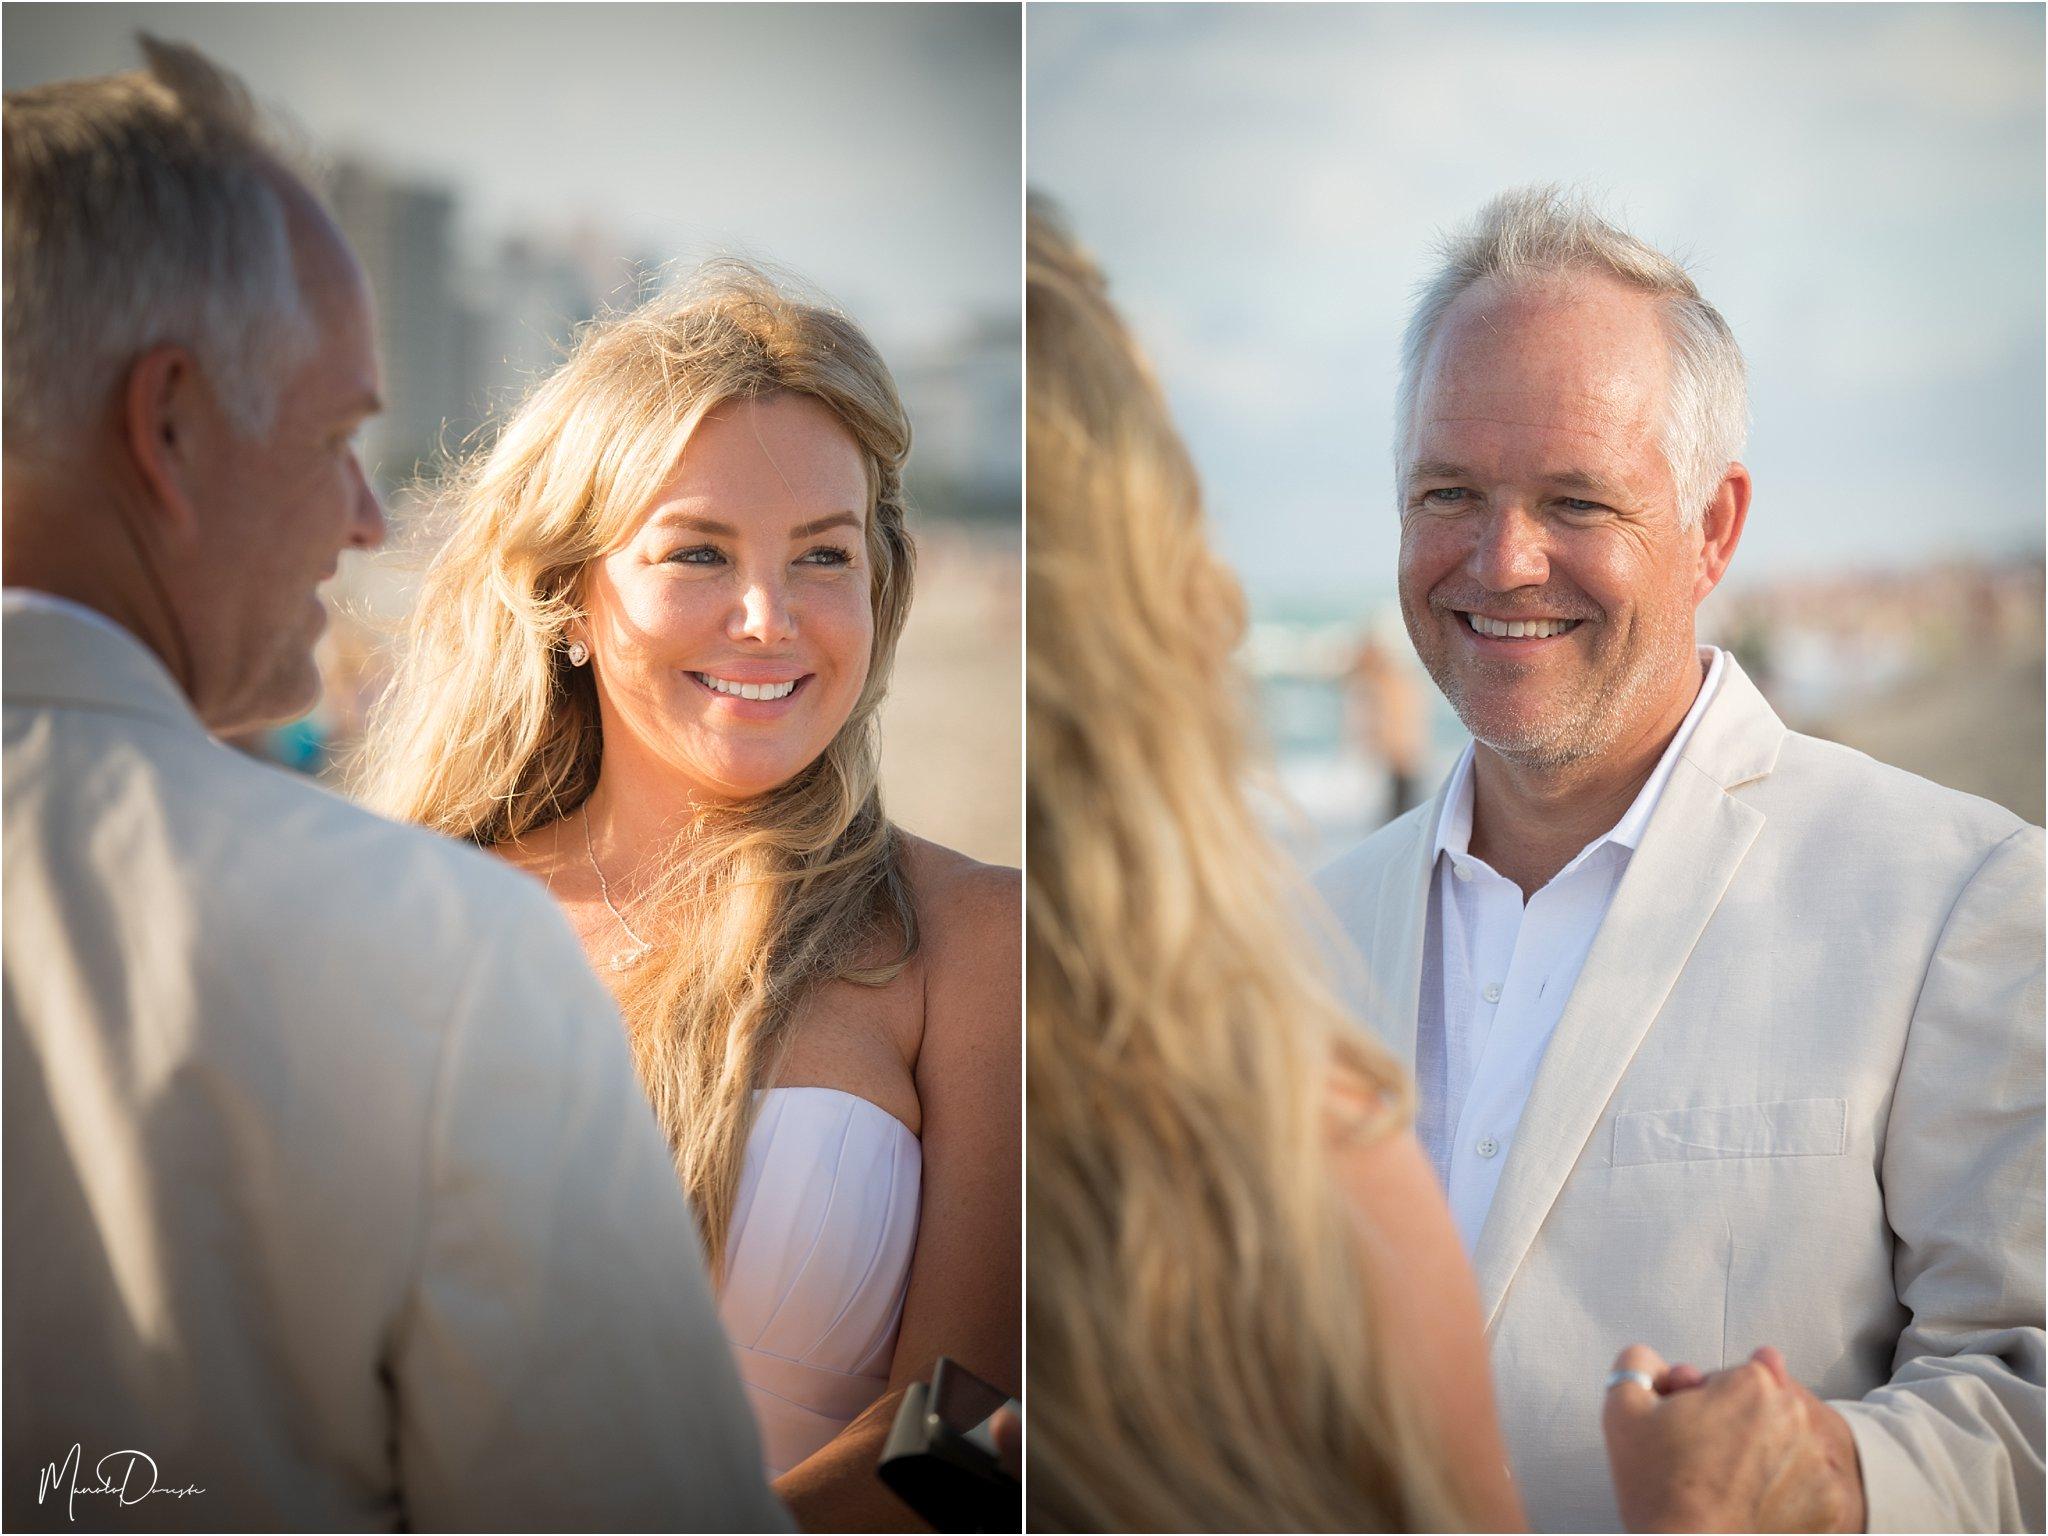 0391_ManoloDoreste_InFocusStudios_Wedding_Family_Photography_Miami_MiamiPhotographer.jpg